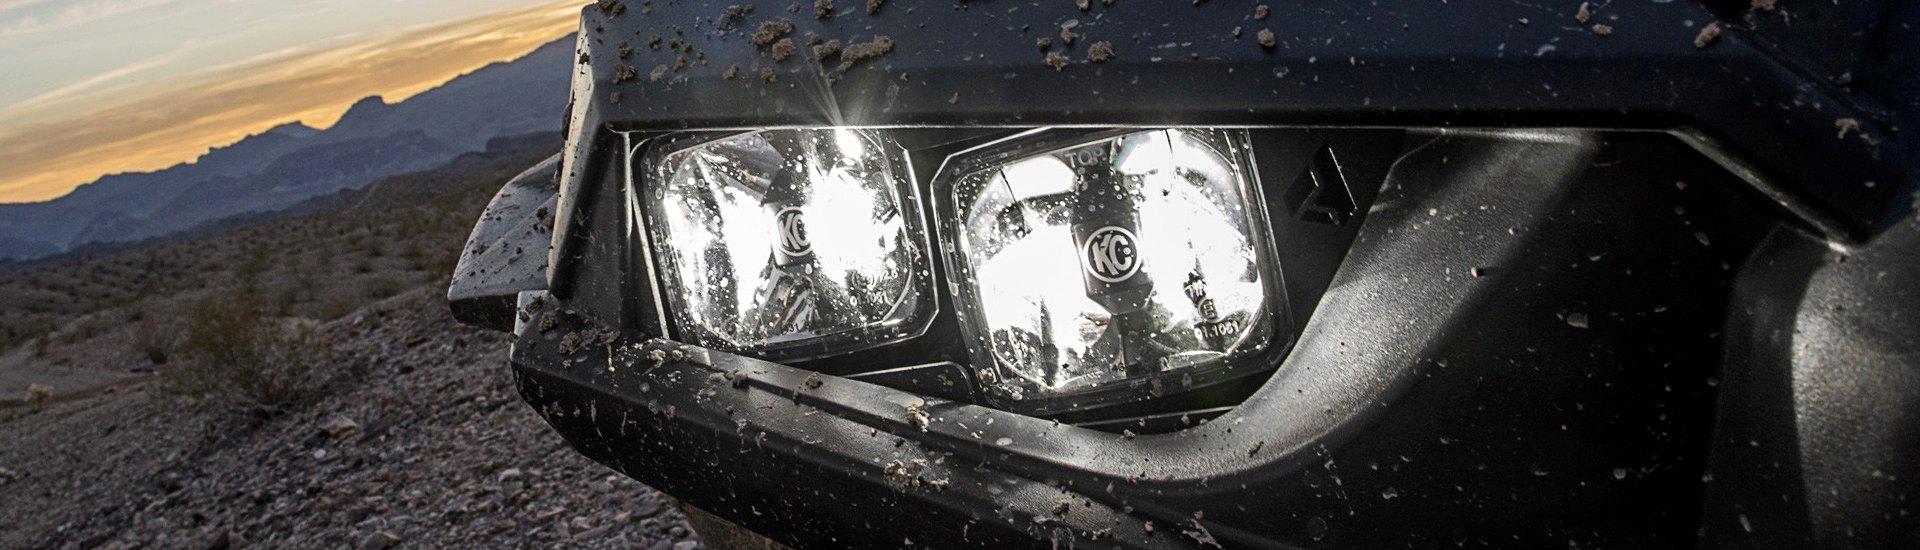 Utv Headlights Amp Bulbs Led Halo Projector Custom Hid